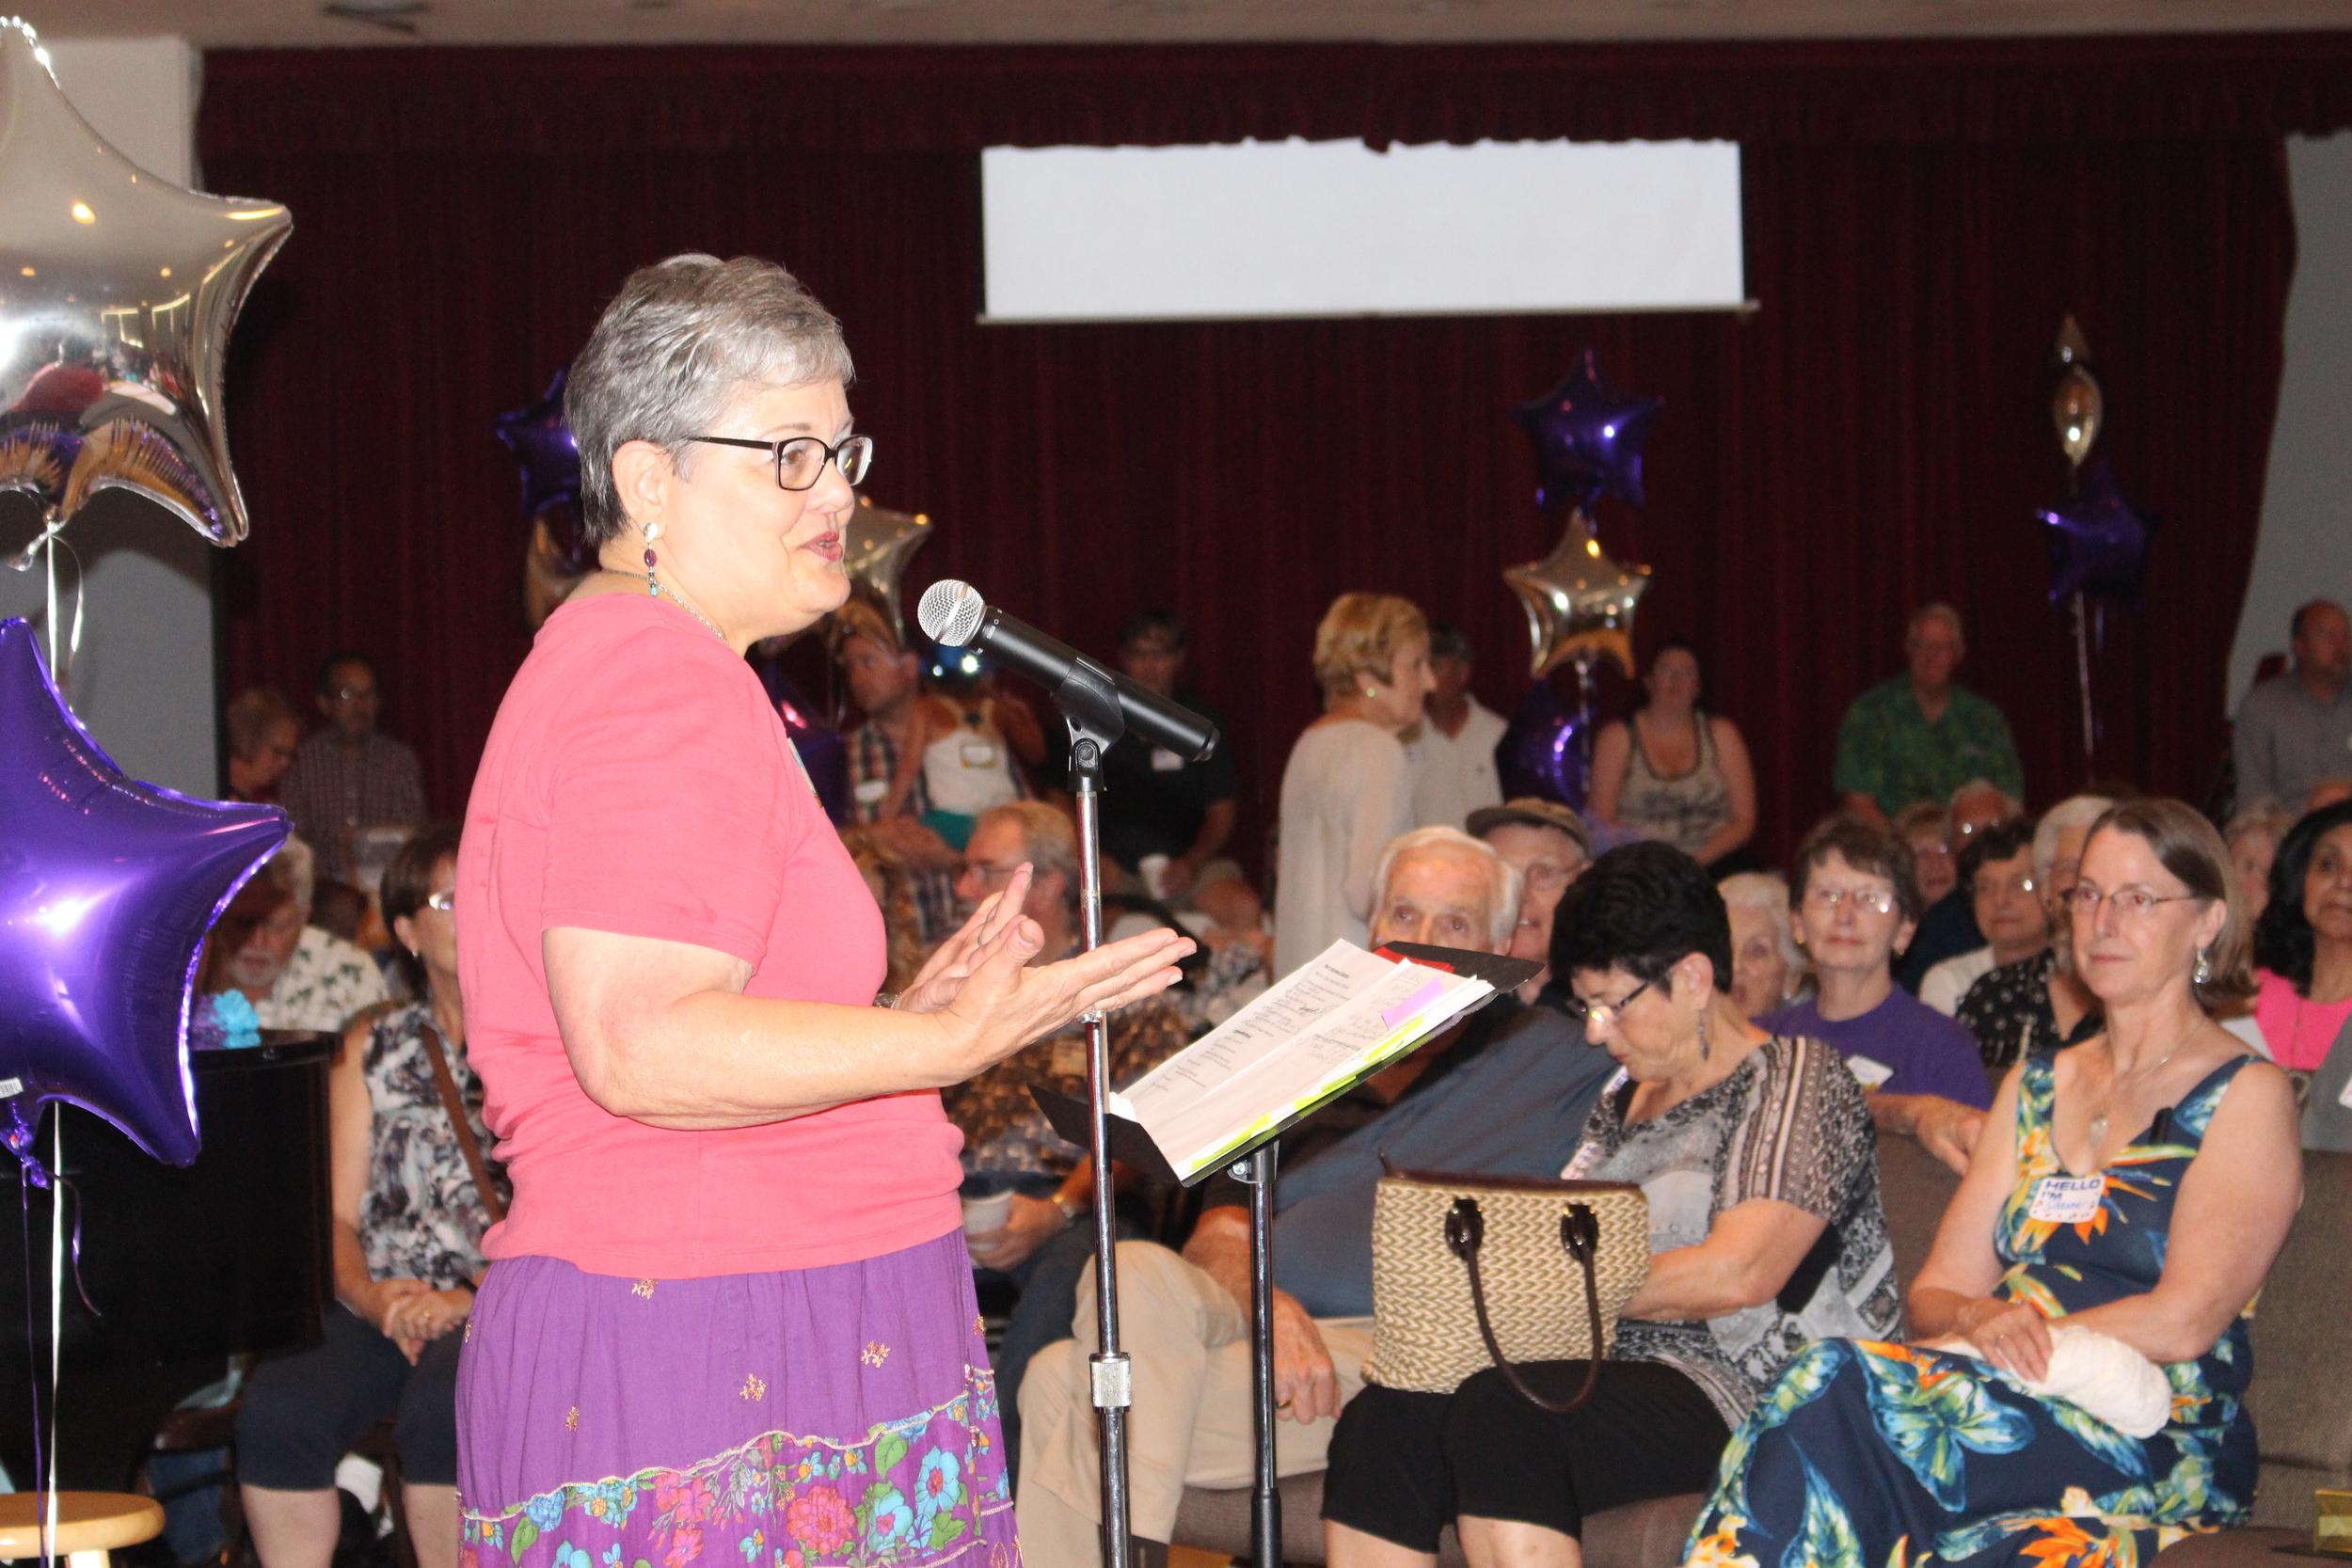 Emcee Rev. Sharon Rhodes-Wickett